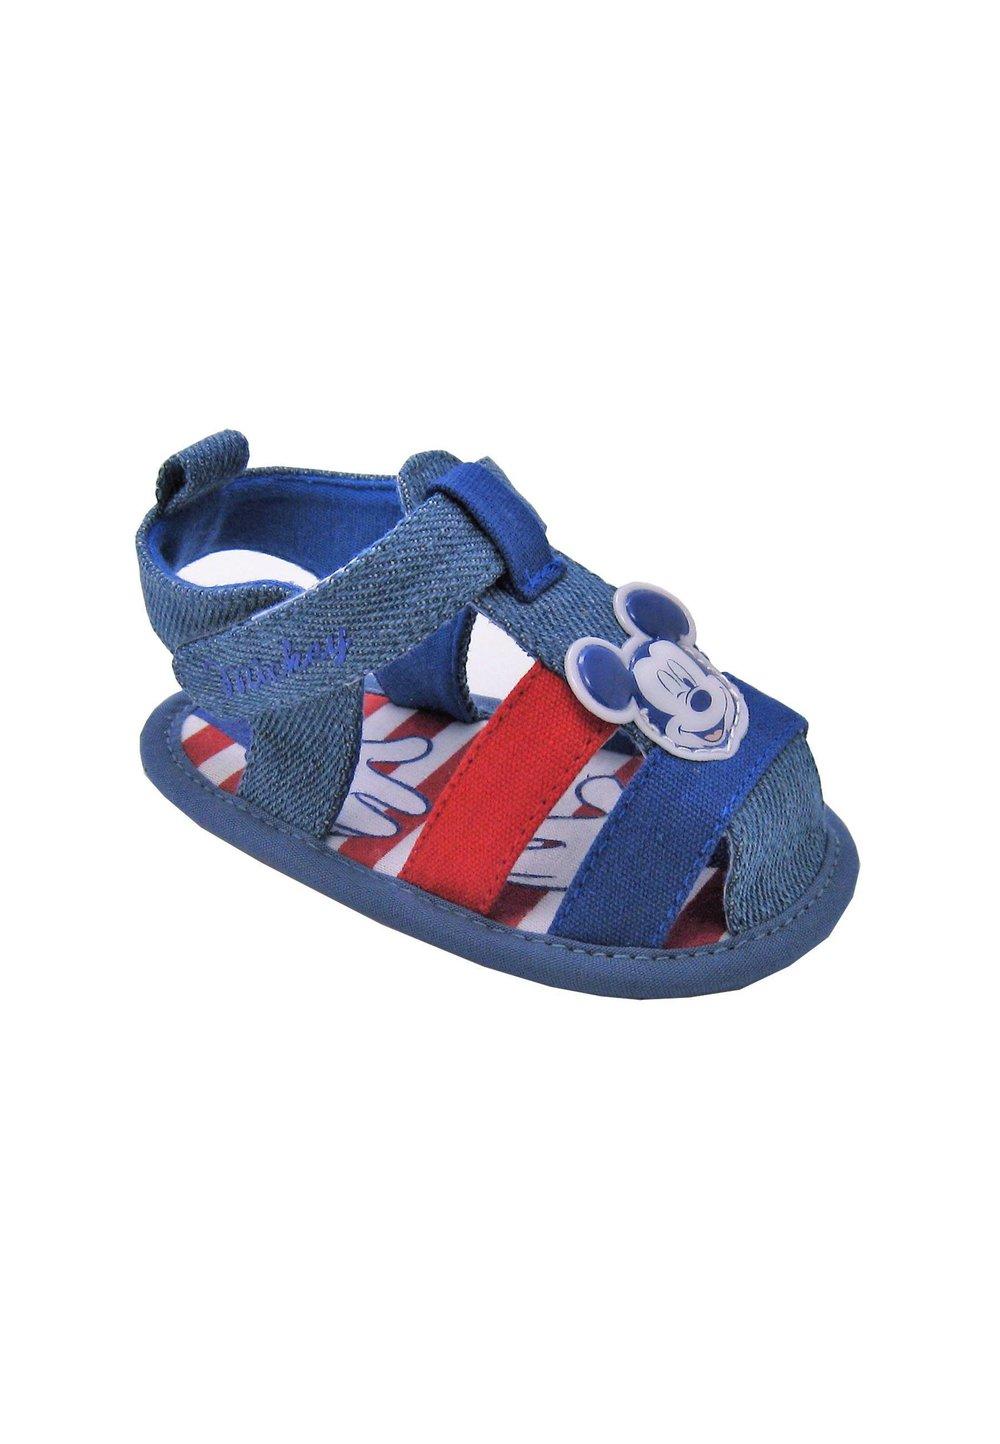 Incaltaminte bebe, Mickey Mouse, jeans imagine